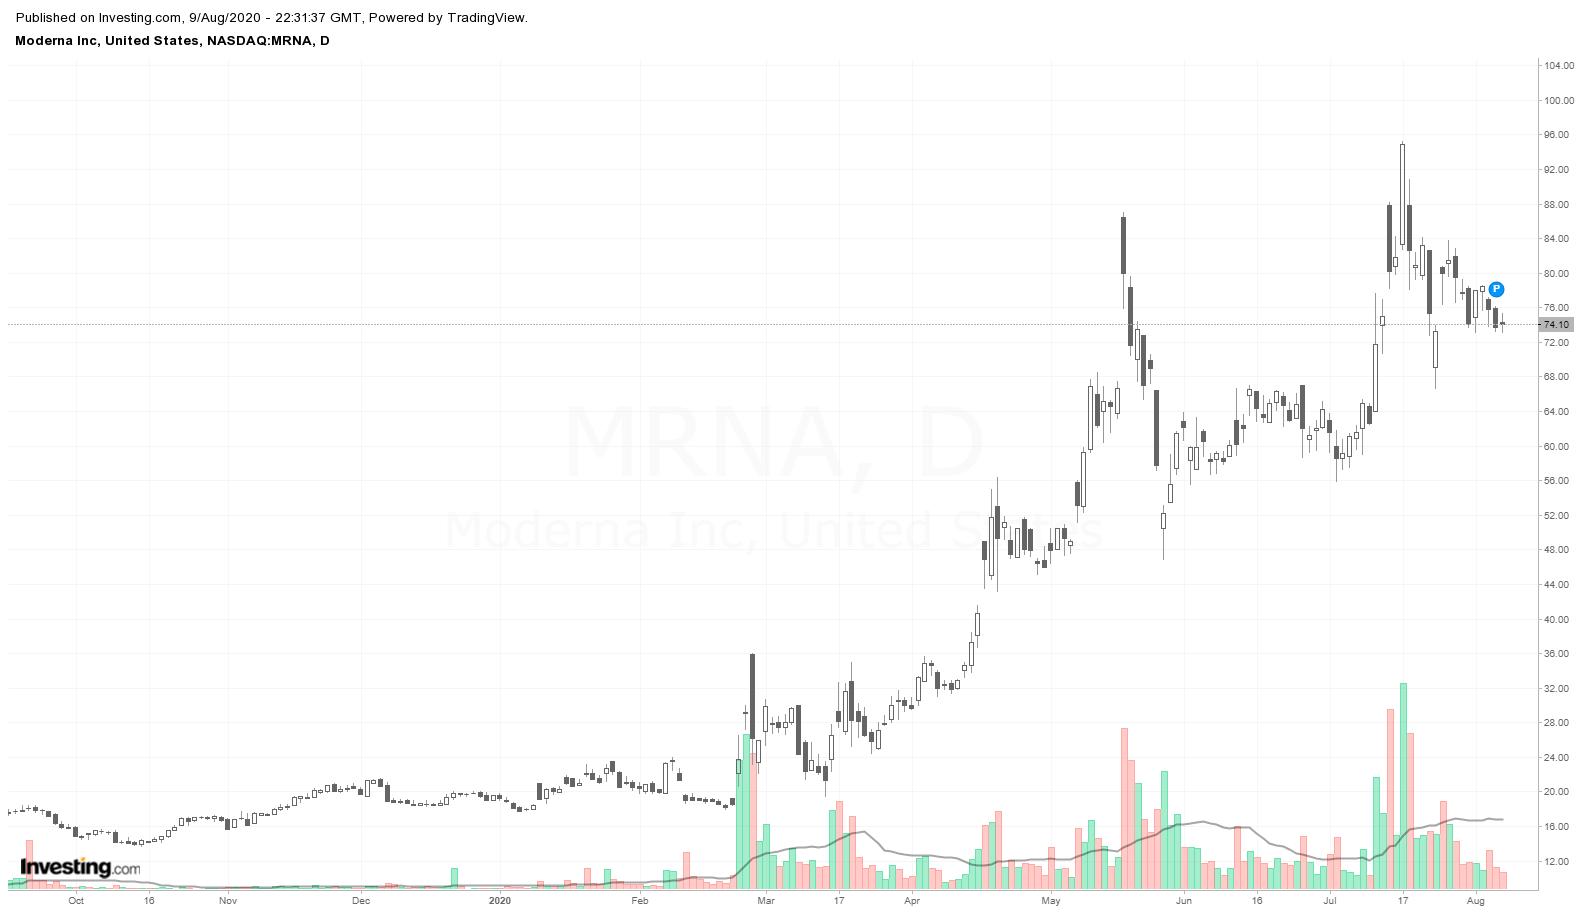 Moderna, Inc (MRNA) daily chart candles, YTD, Aug 2020